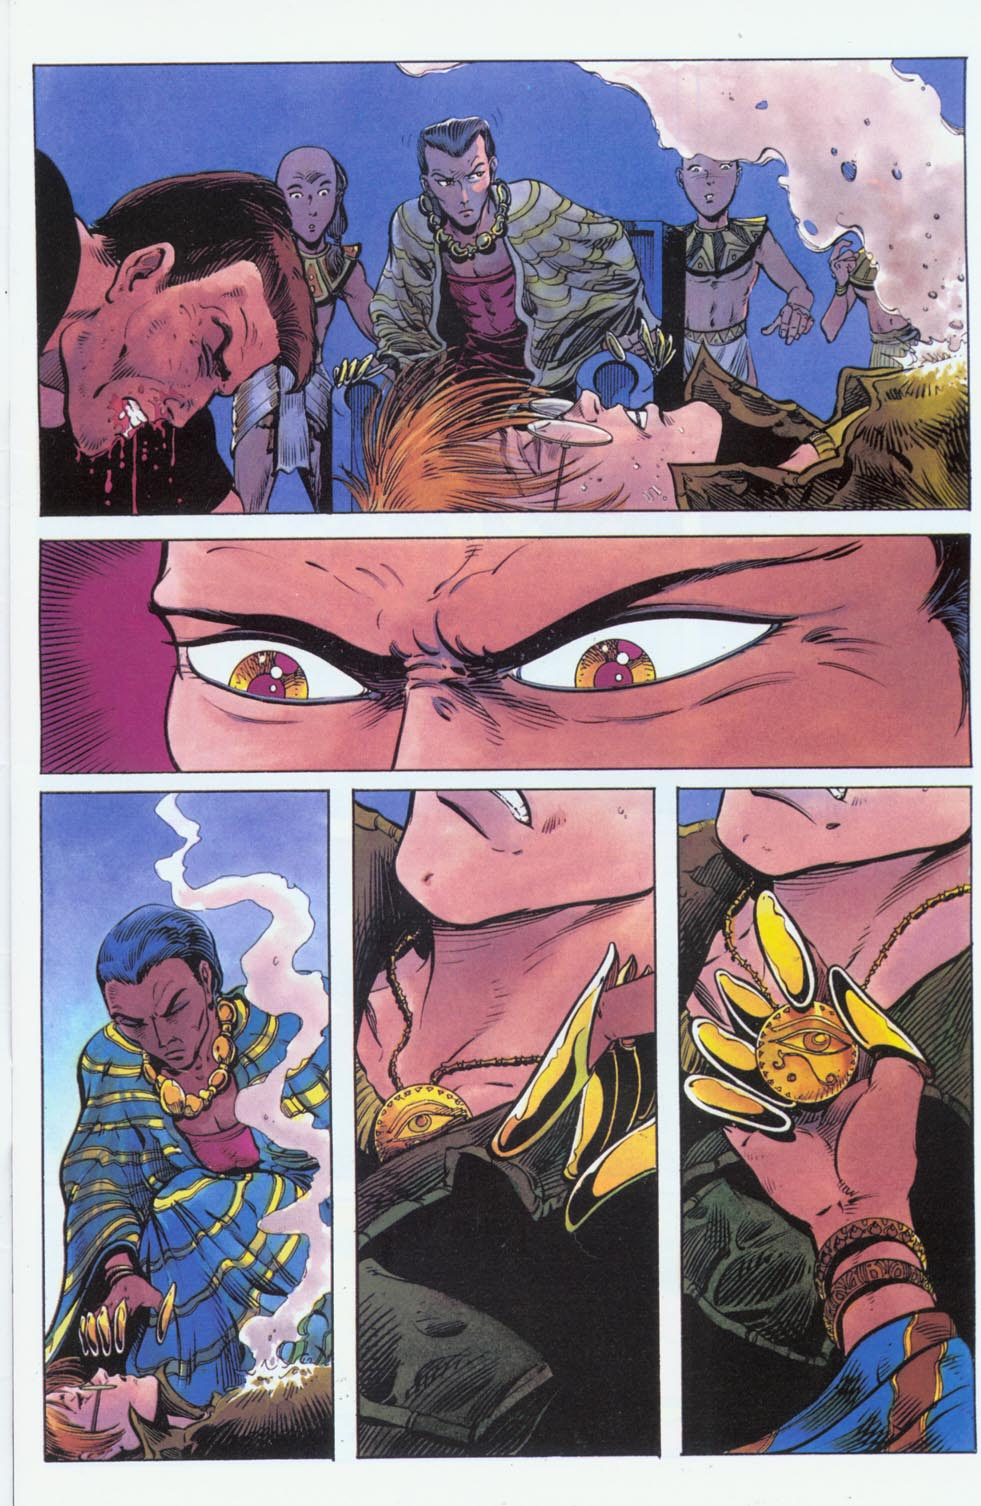 Read online Stargate comic -  Issue #3 - 7